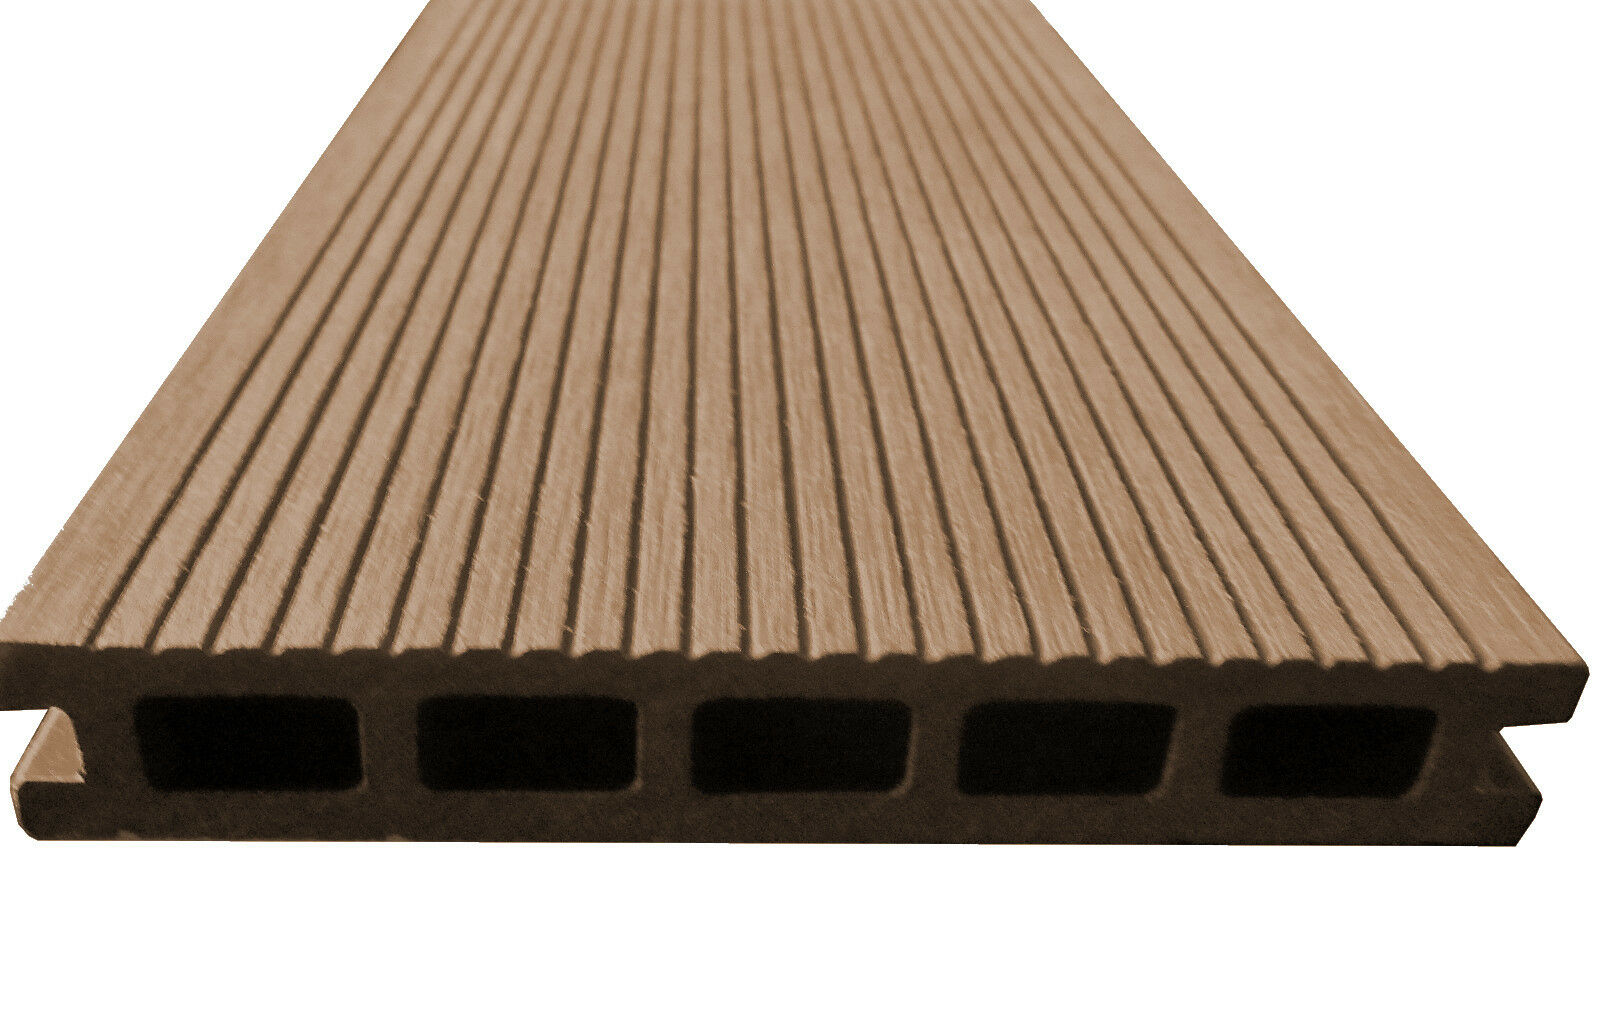 10m bpc terrassendielen 2 90m braun terrassenholz terrassendeck dielen holz wpc ebay. Black Bedroom Furniture Sets. Home Design Ideas